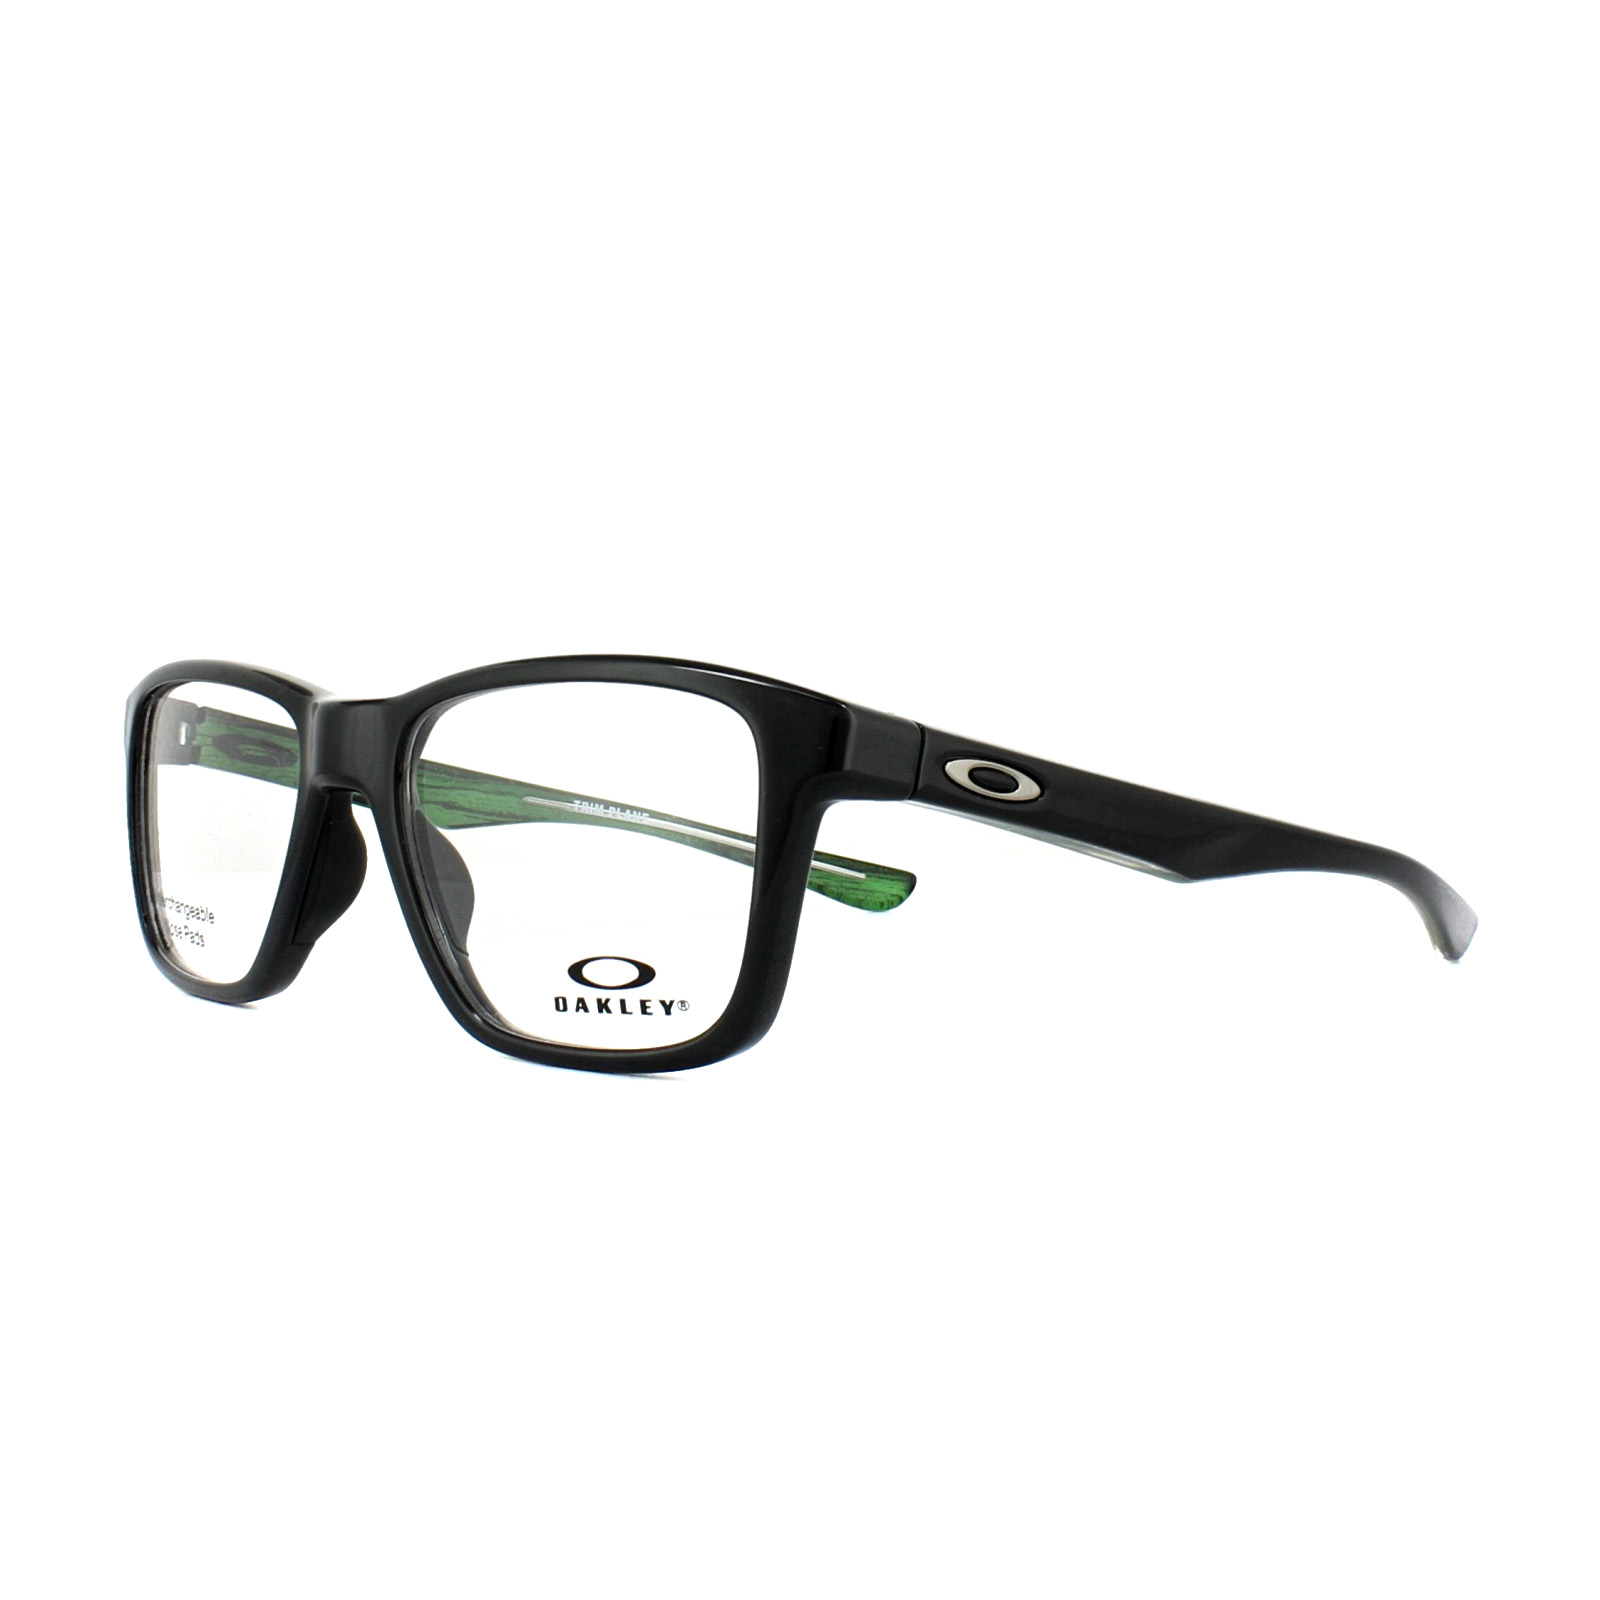 0108a5a0e7 Sentinel Oakley Glasses Frames Trim Plane OX8107-02 Polished Black 53mm Mens